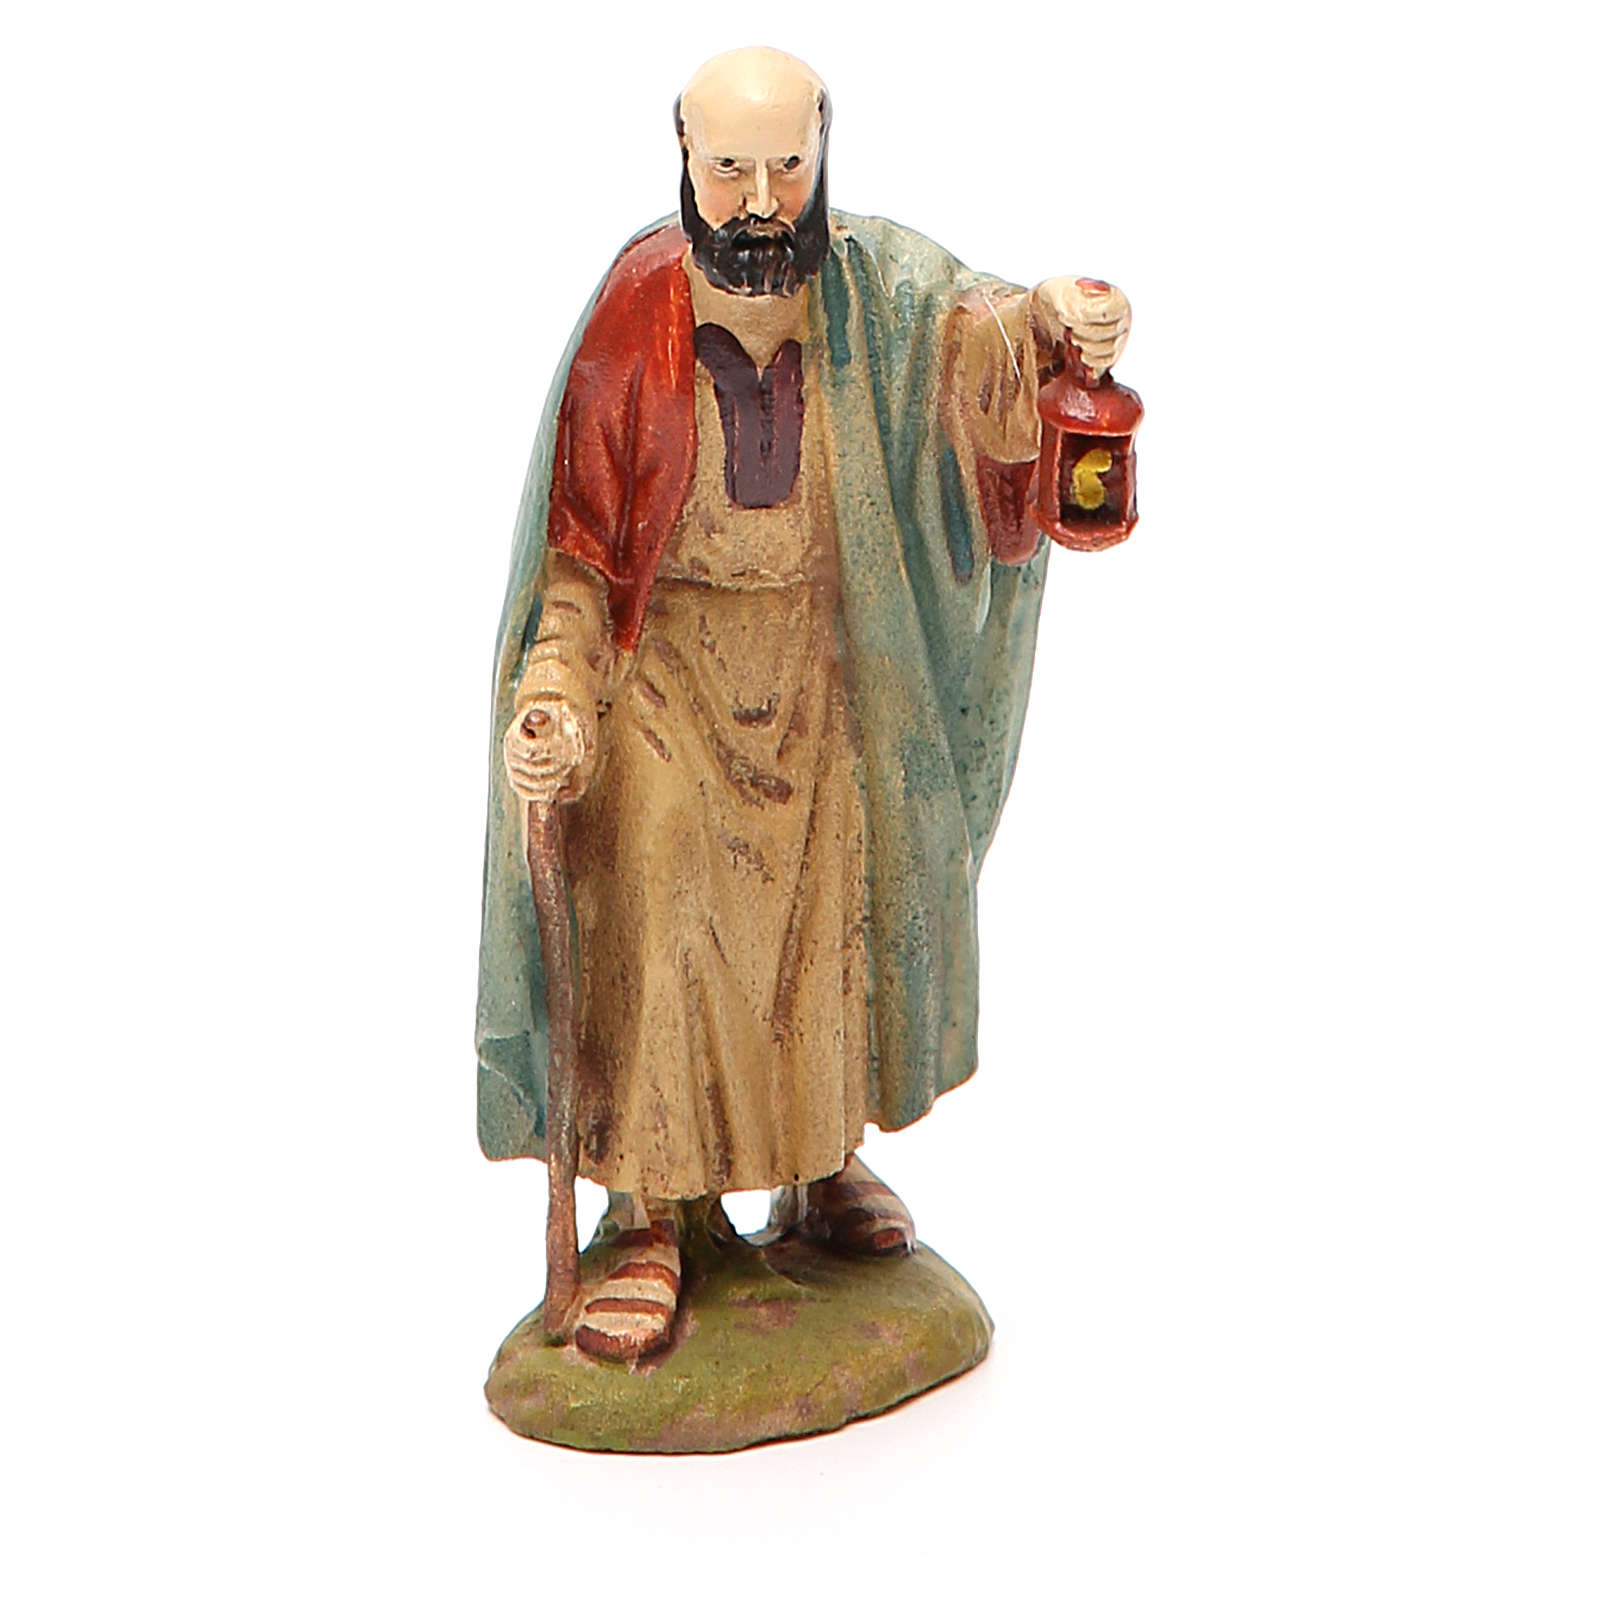 Shepherd with lantern in painted resin 10cm Landi Collection 3